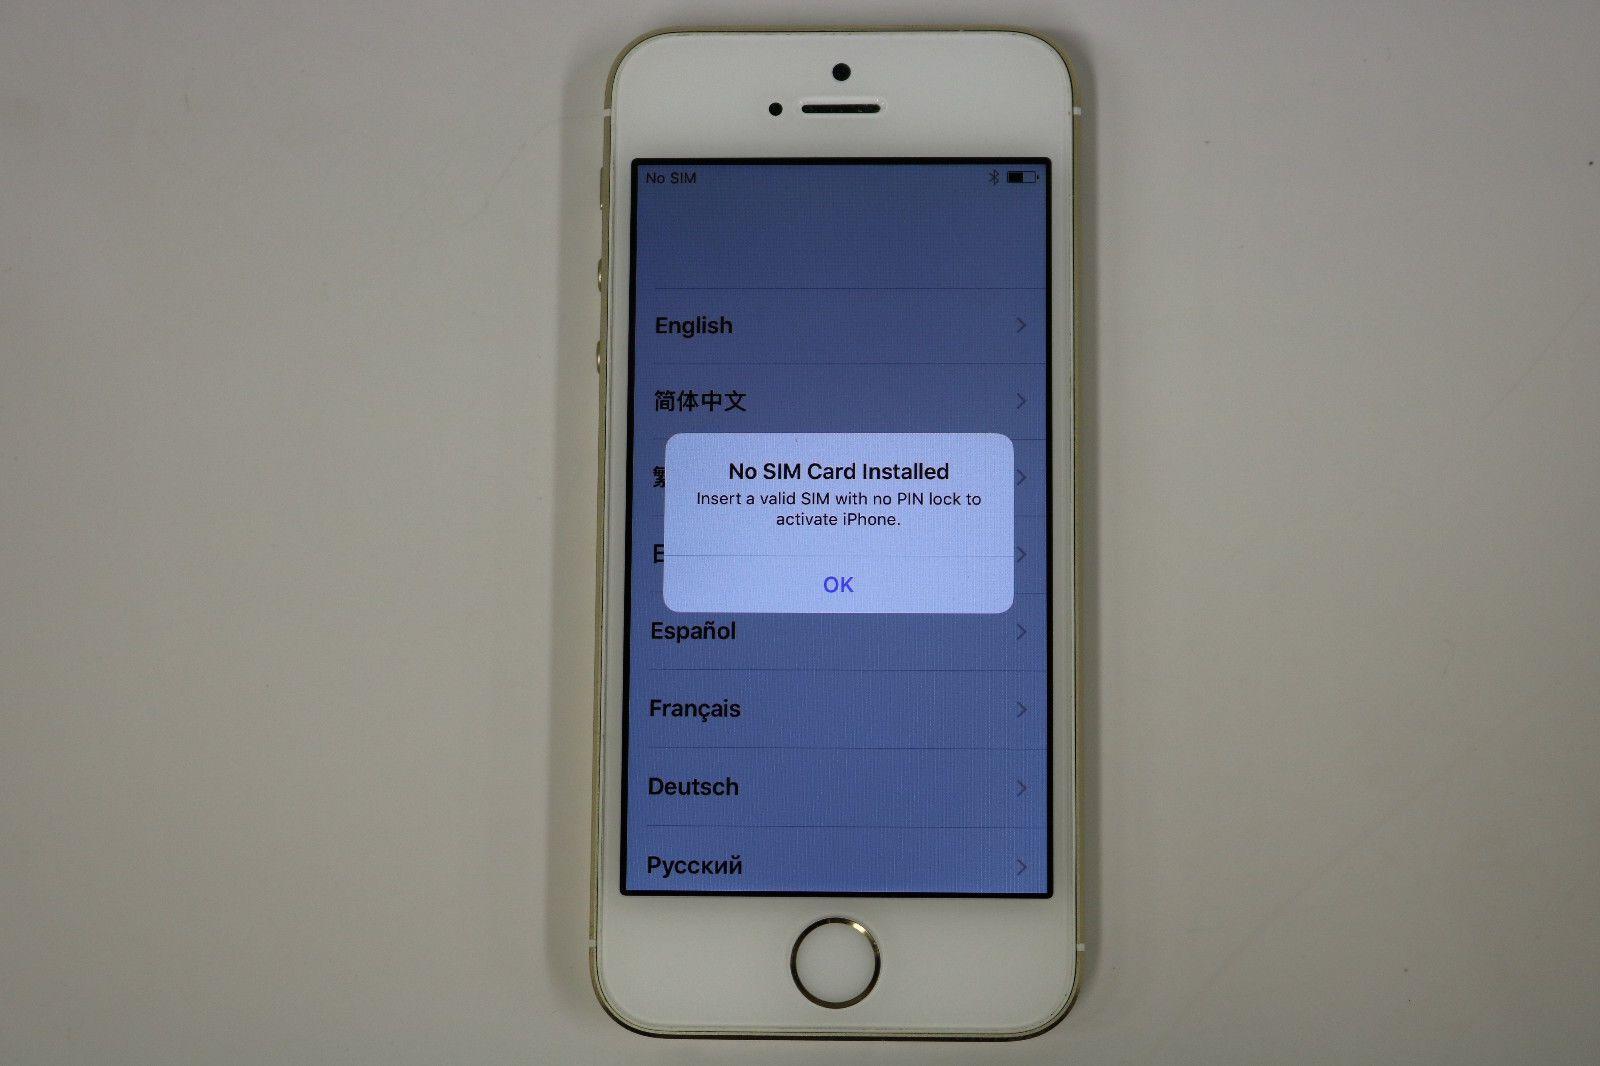 Apple iPhone 5s A1533 ME341LL/A 32GB (Verizon) Gold -  NO RESERVE (0127) https://t.co/ZqDpMitiRZ https://t.co/xPLHOMCQuM